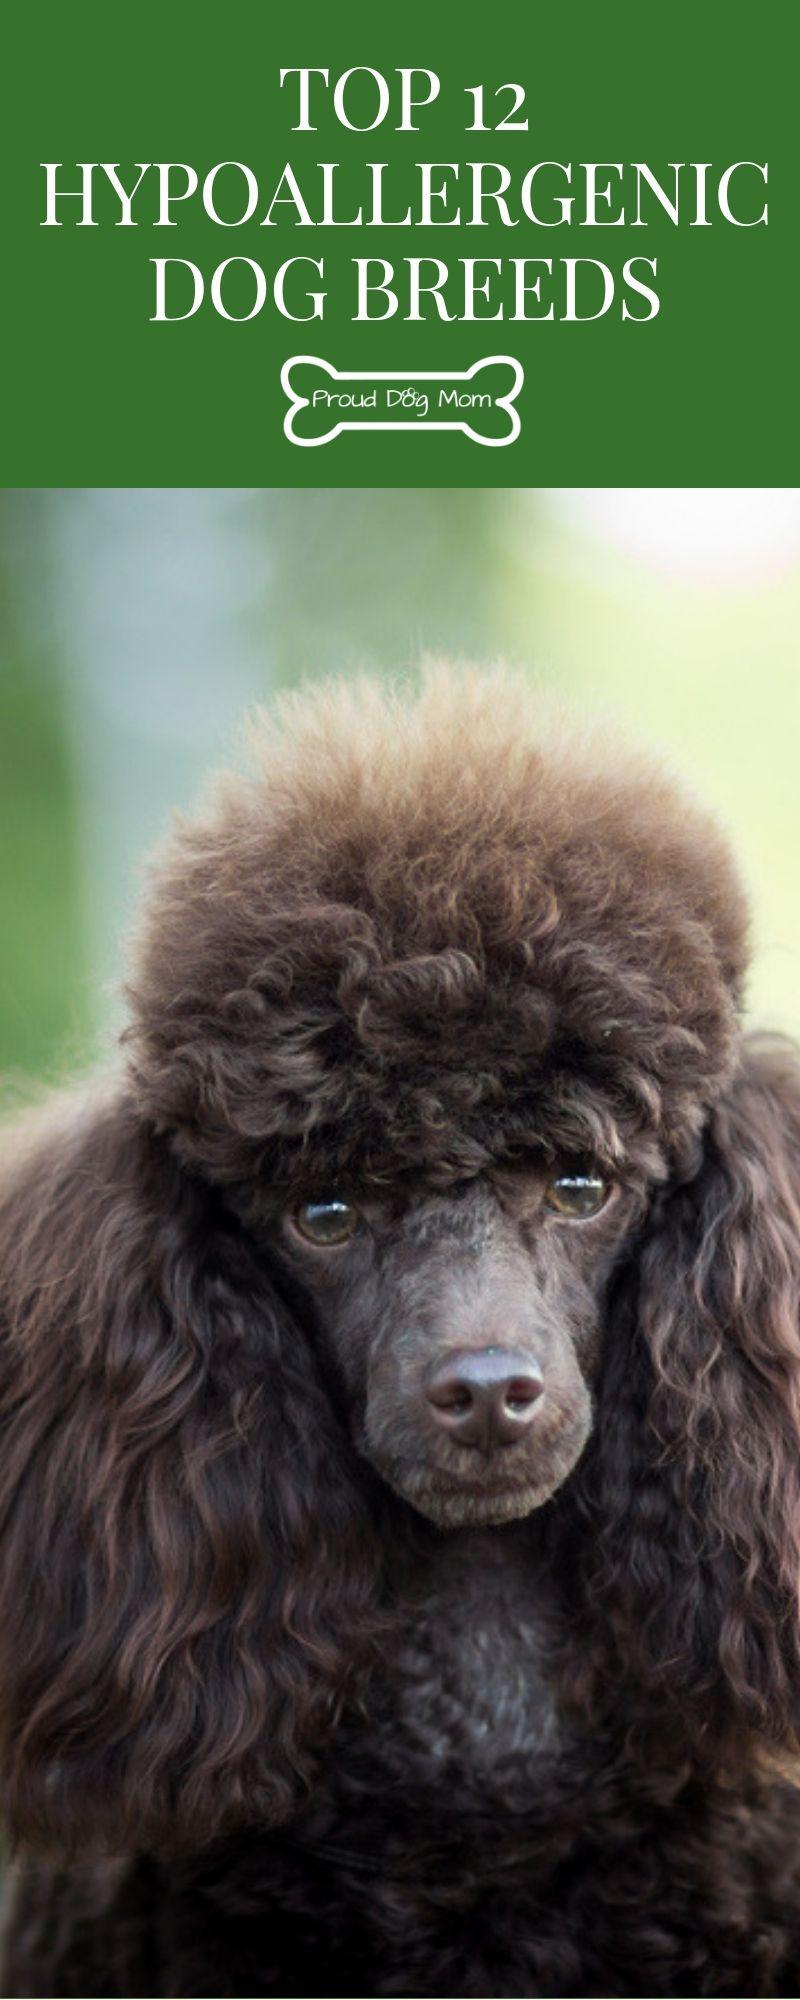 Top 12 Hypoallergenic Dog Breeds Hypoallergenic dog